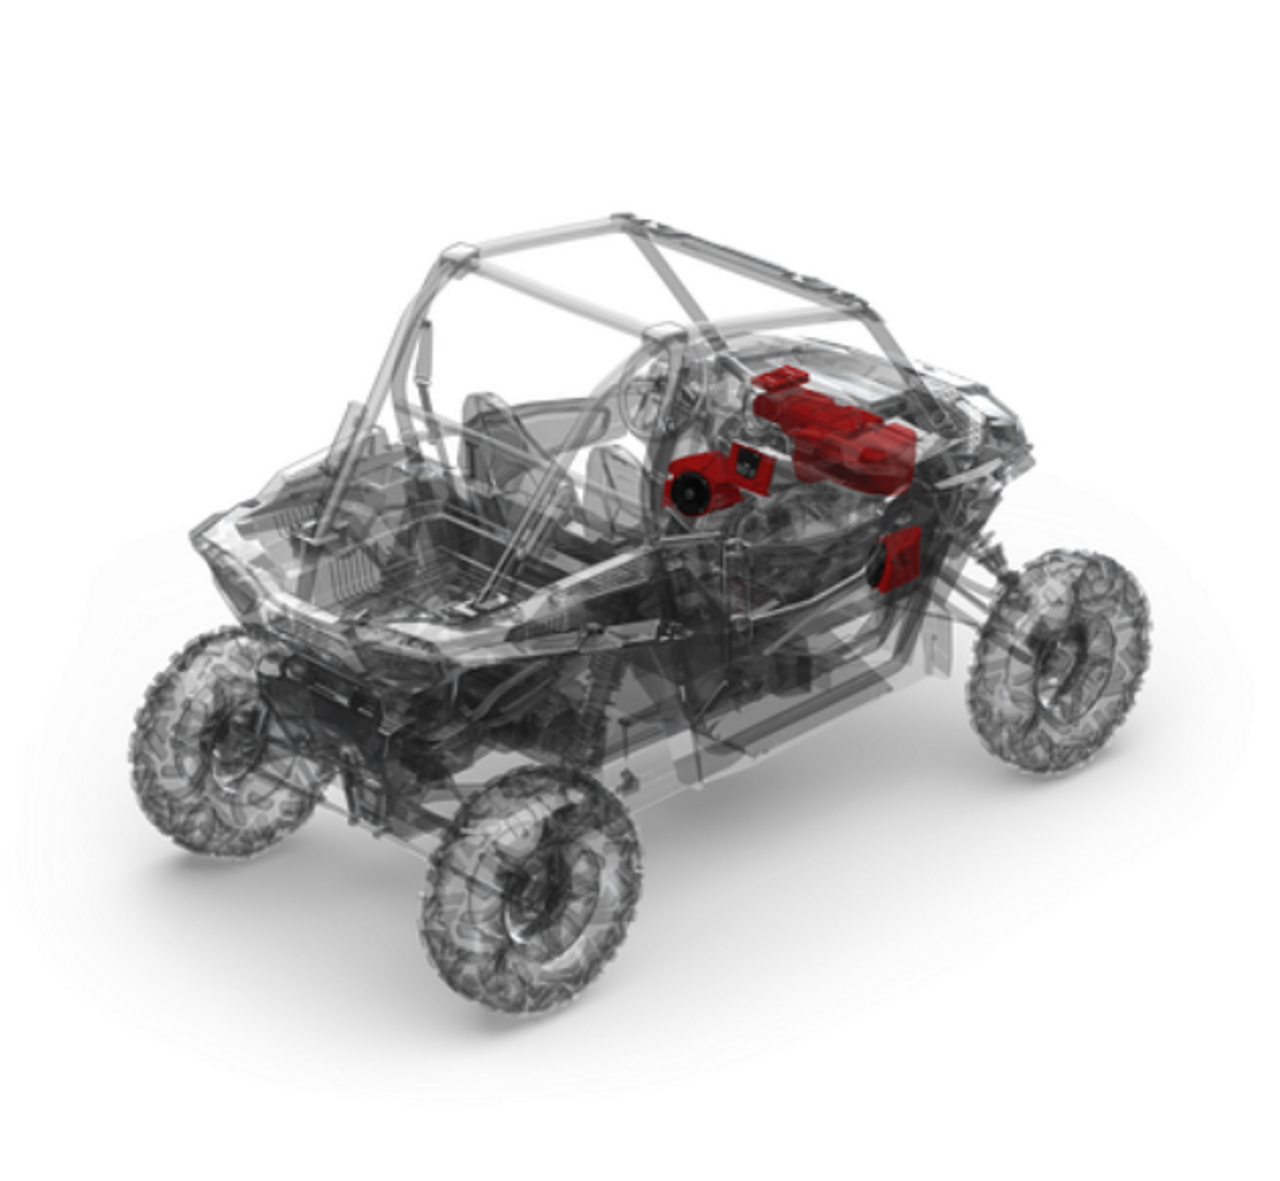 RZR Stage3 Kit